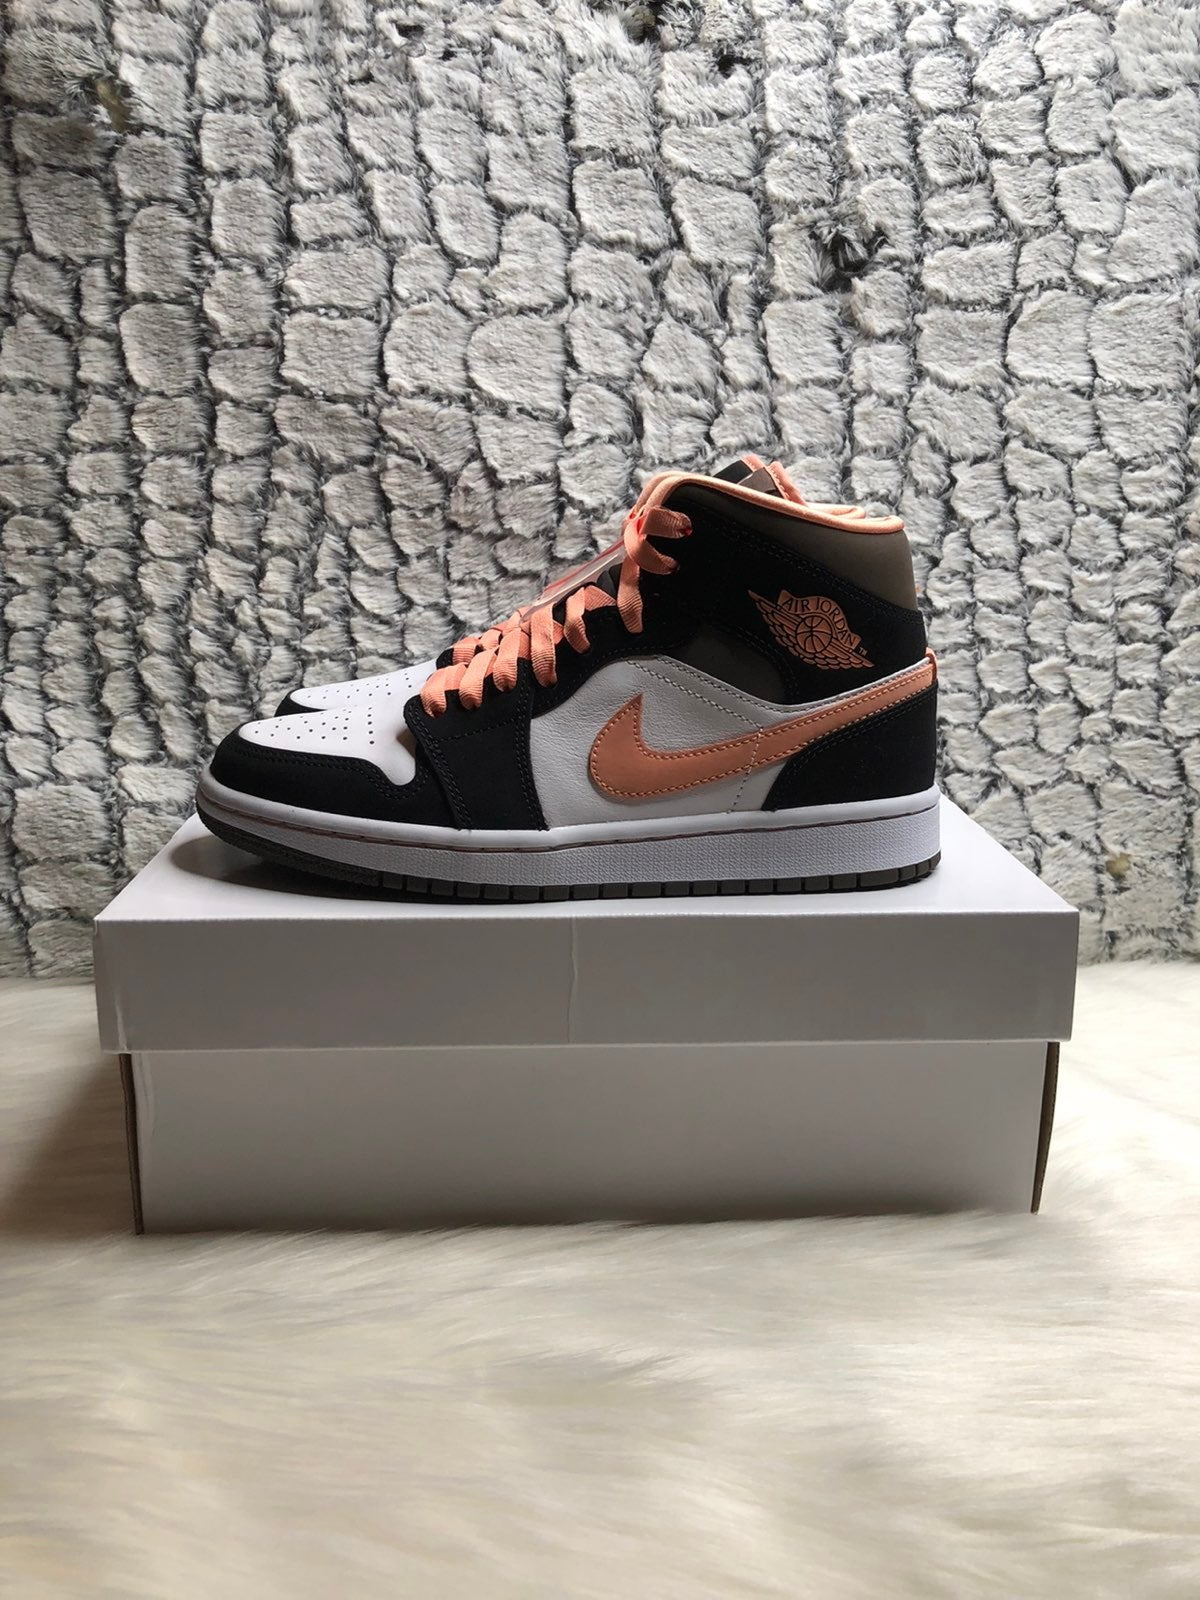 Jordan 1 peach mochas